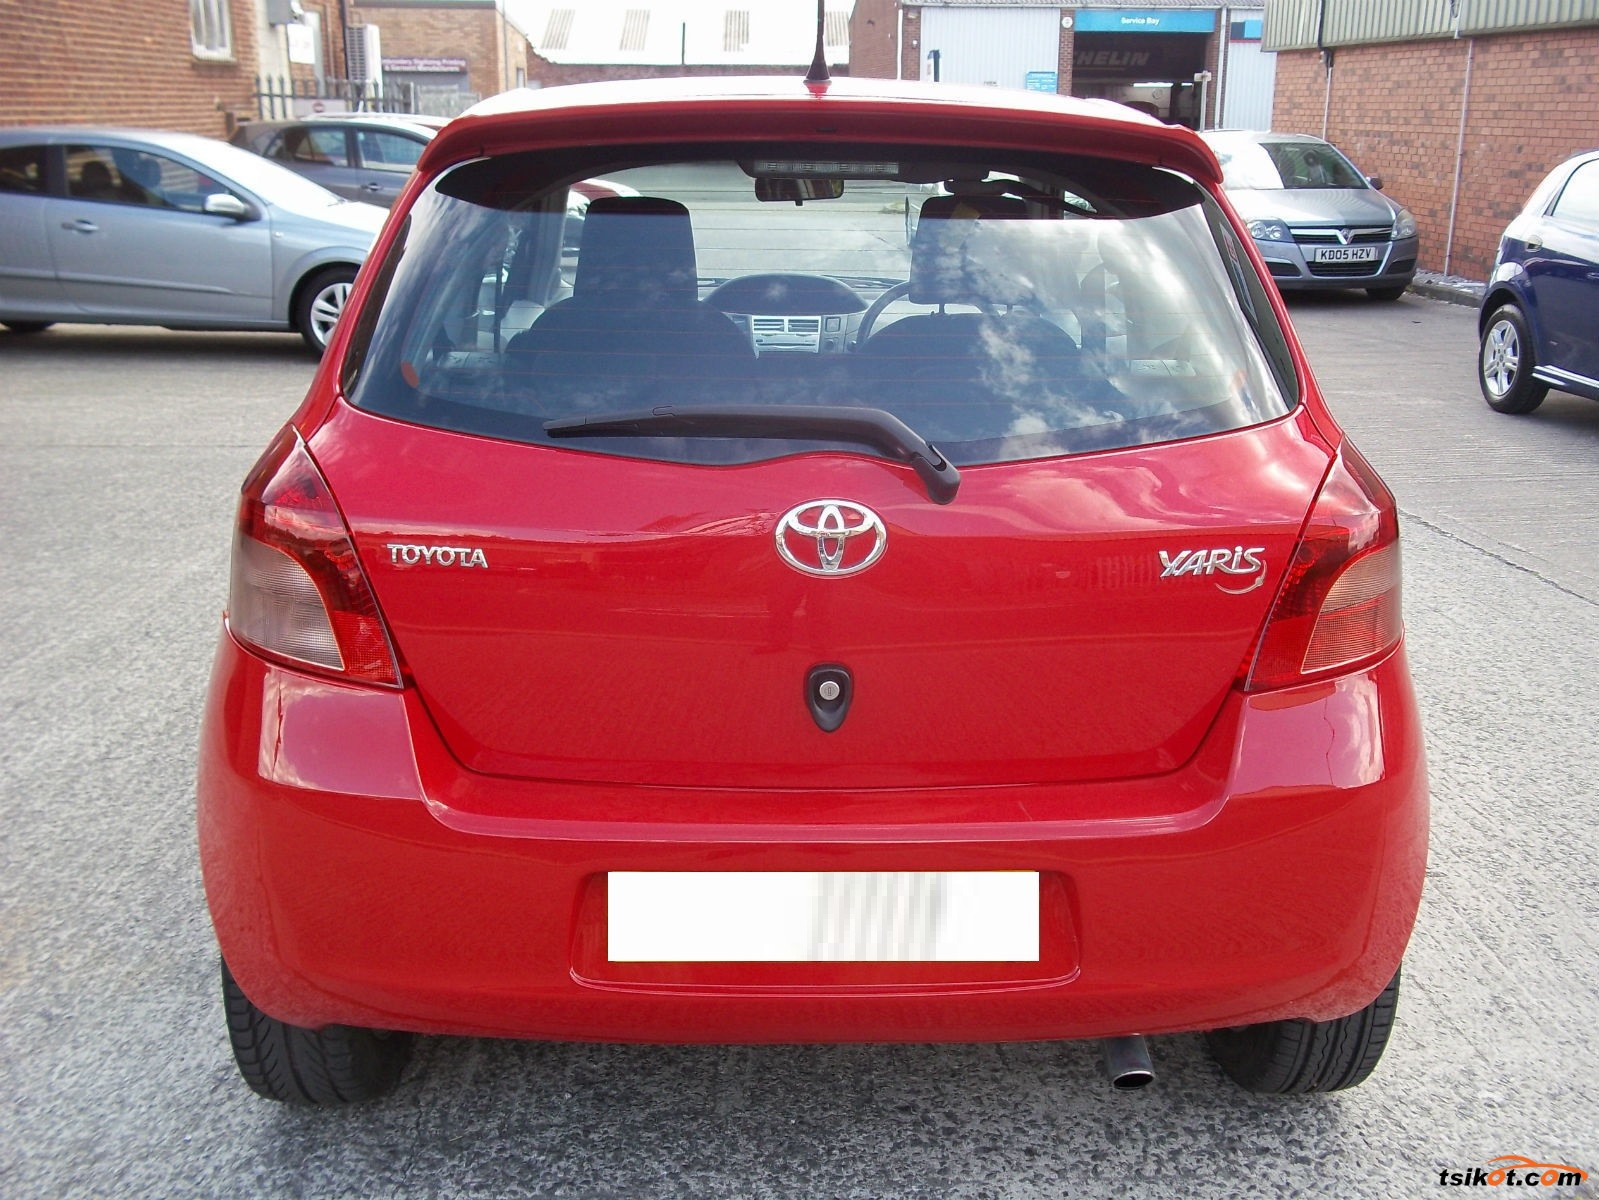 Toyota Yaris 2011 - 2